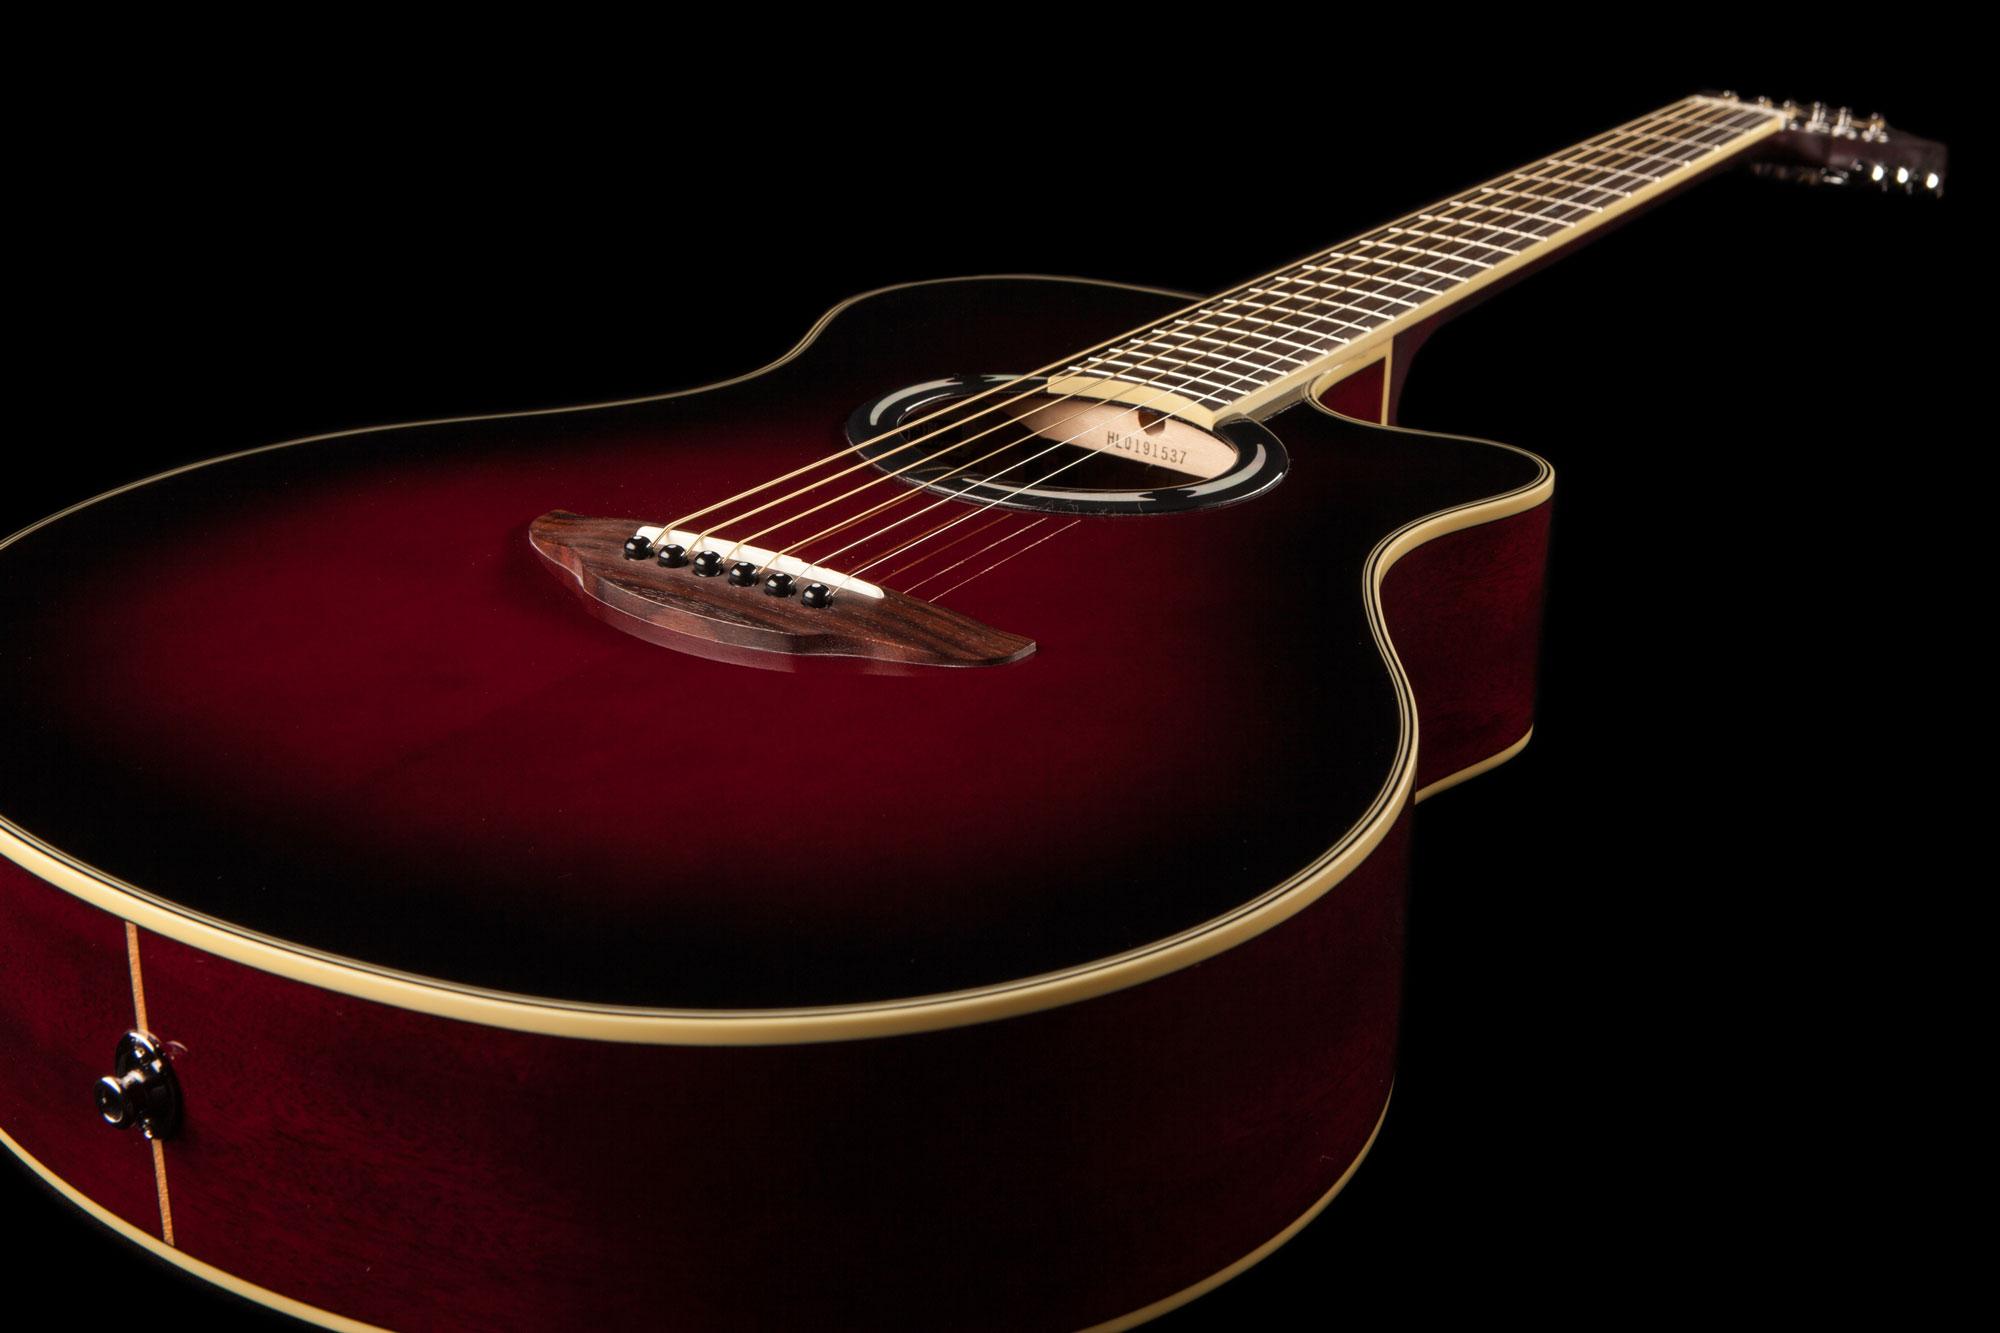 Yamaha Apx500 Mkiii Electro Acoustic Guitar In Dusk Sun